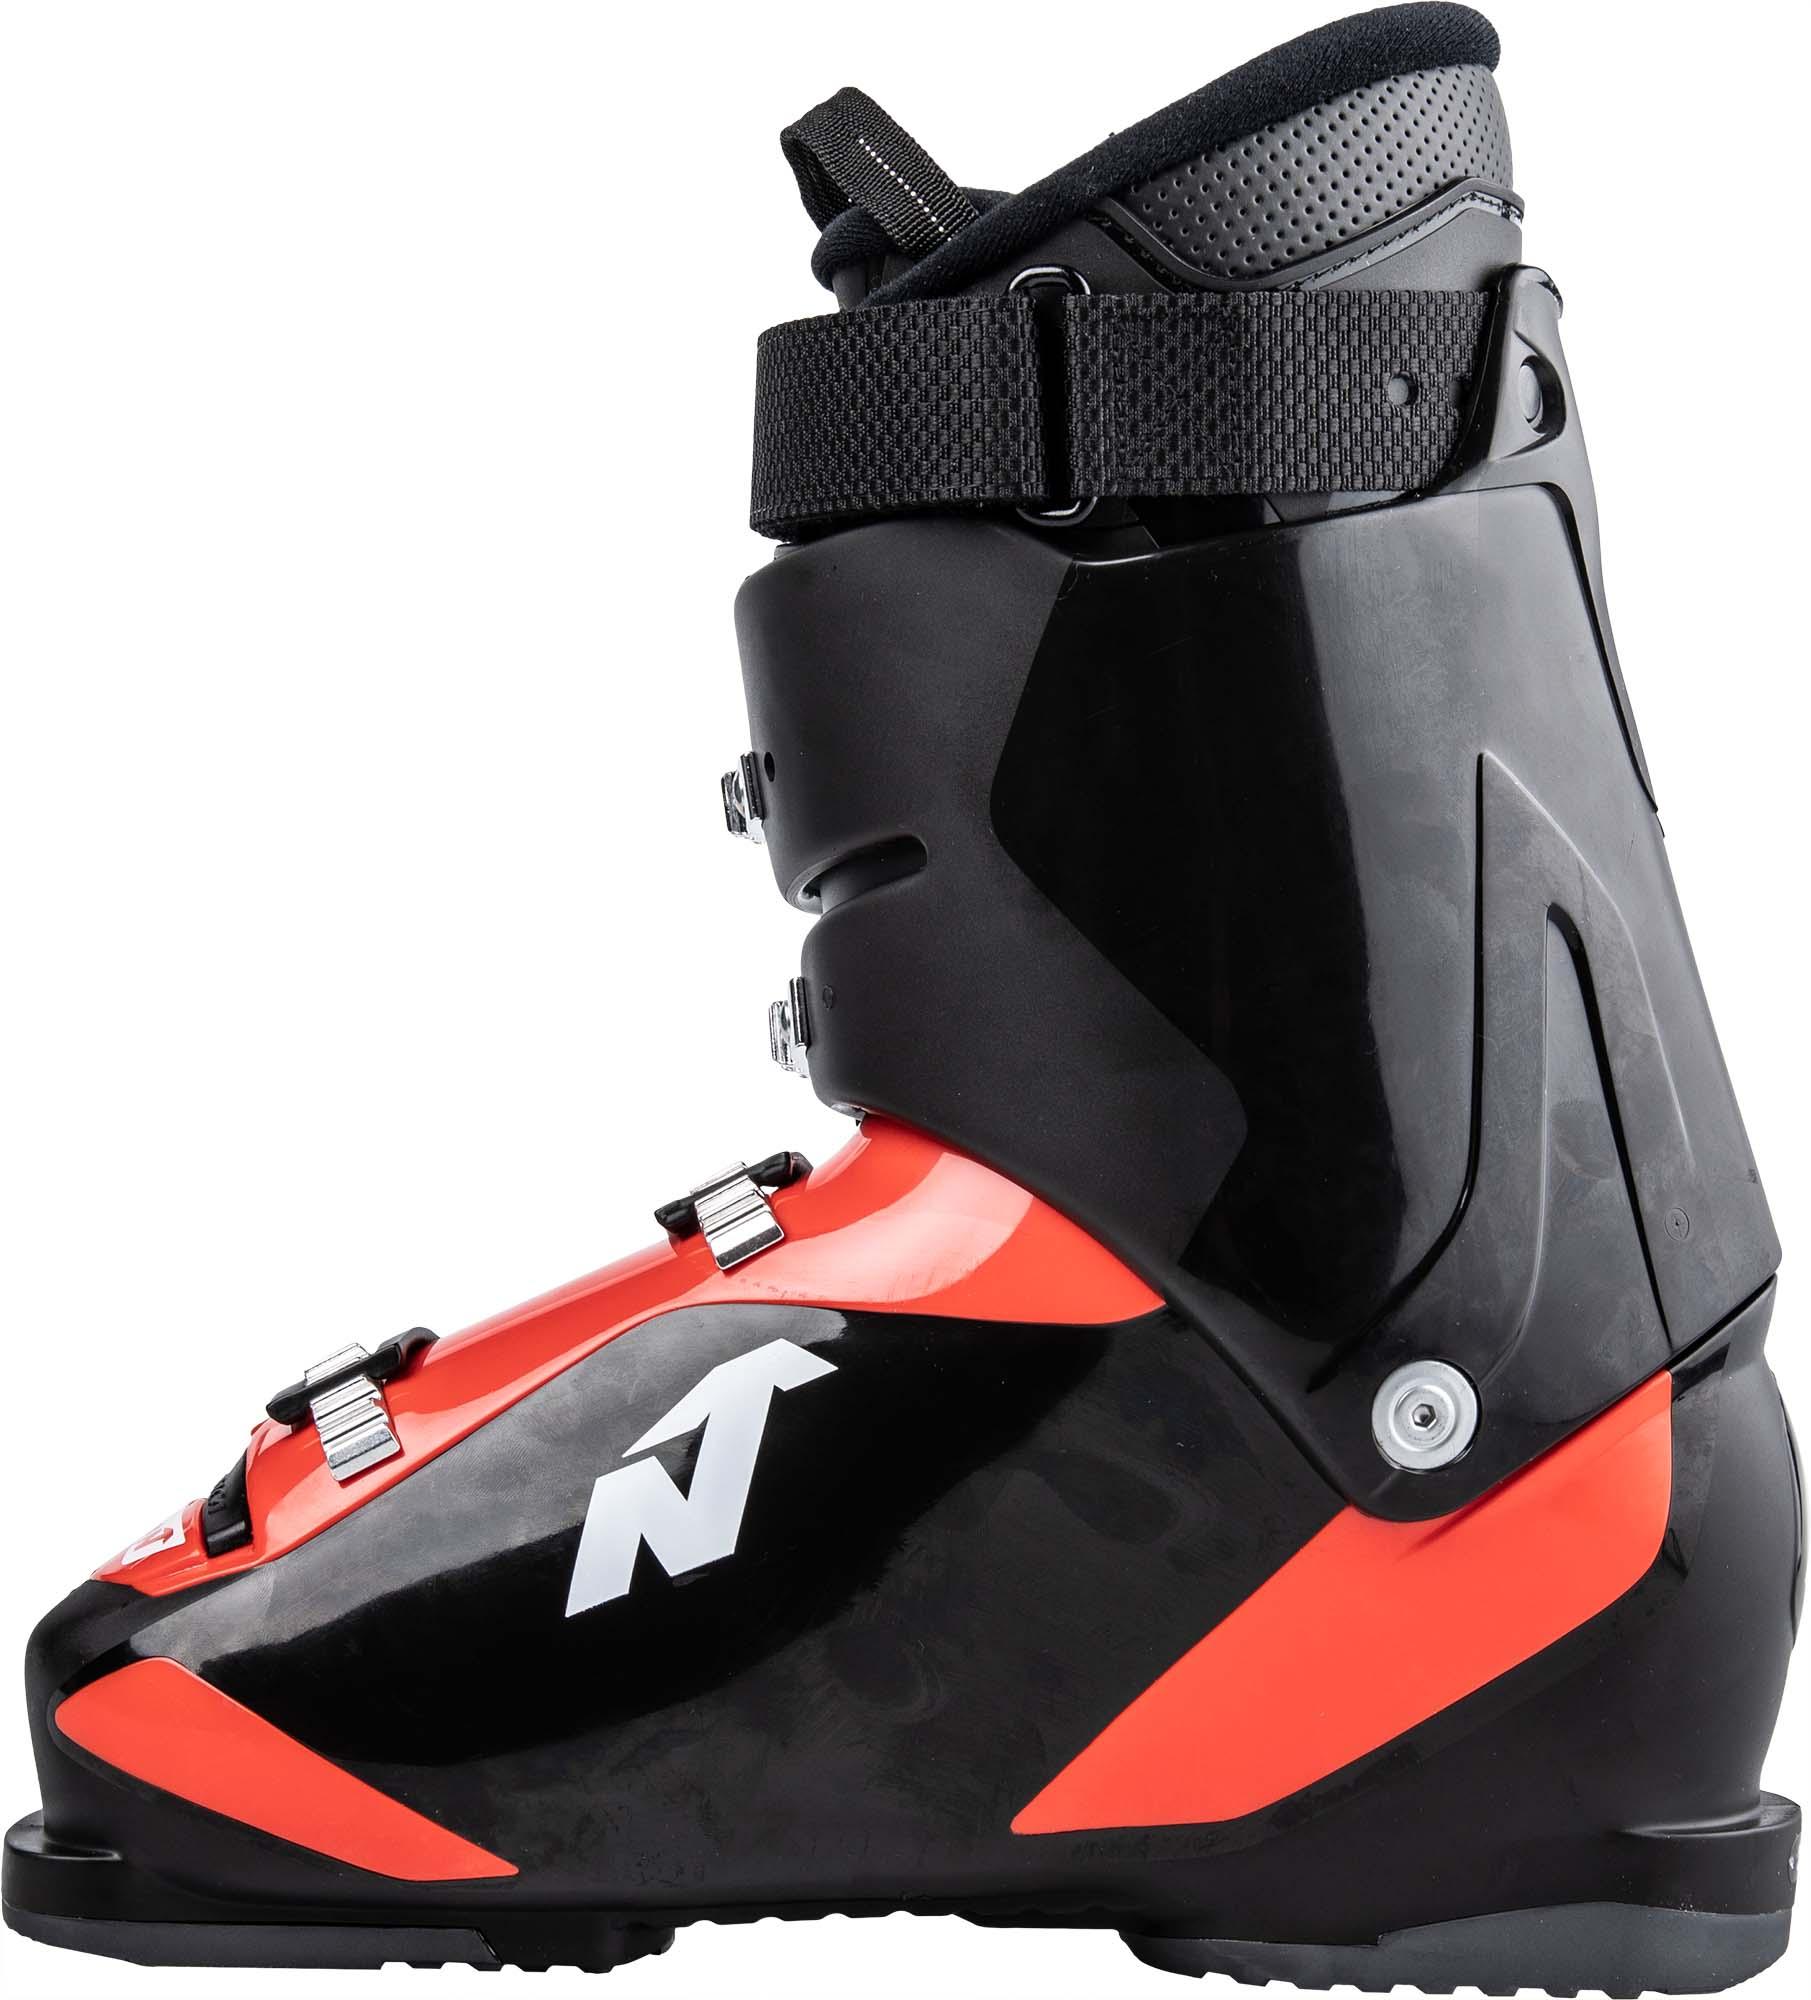 4bf3ae03a8c Nordica CRUISE 60 S. Sjezdové boty. Sjezdové boty. Sjezdové boty. Sjezdové  boty